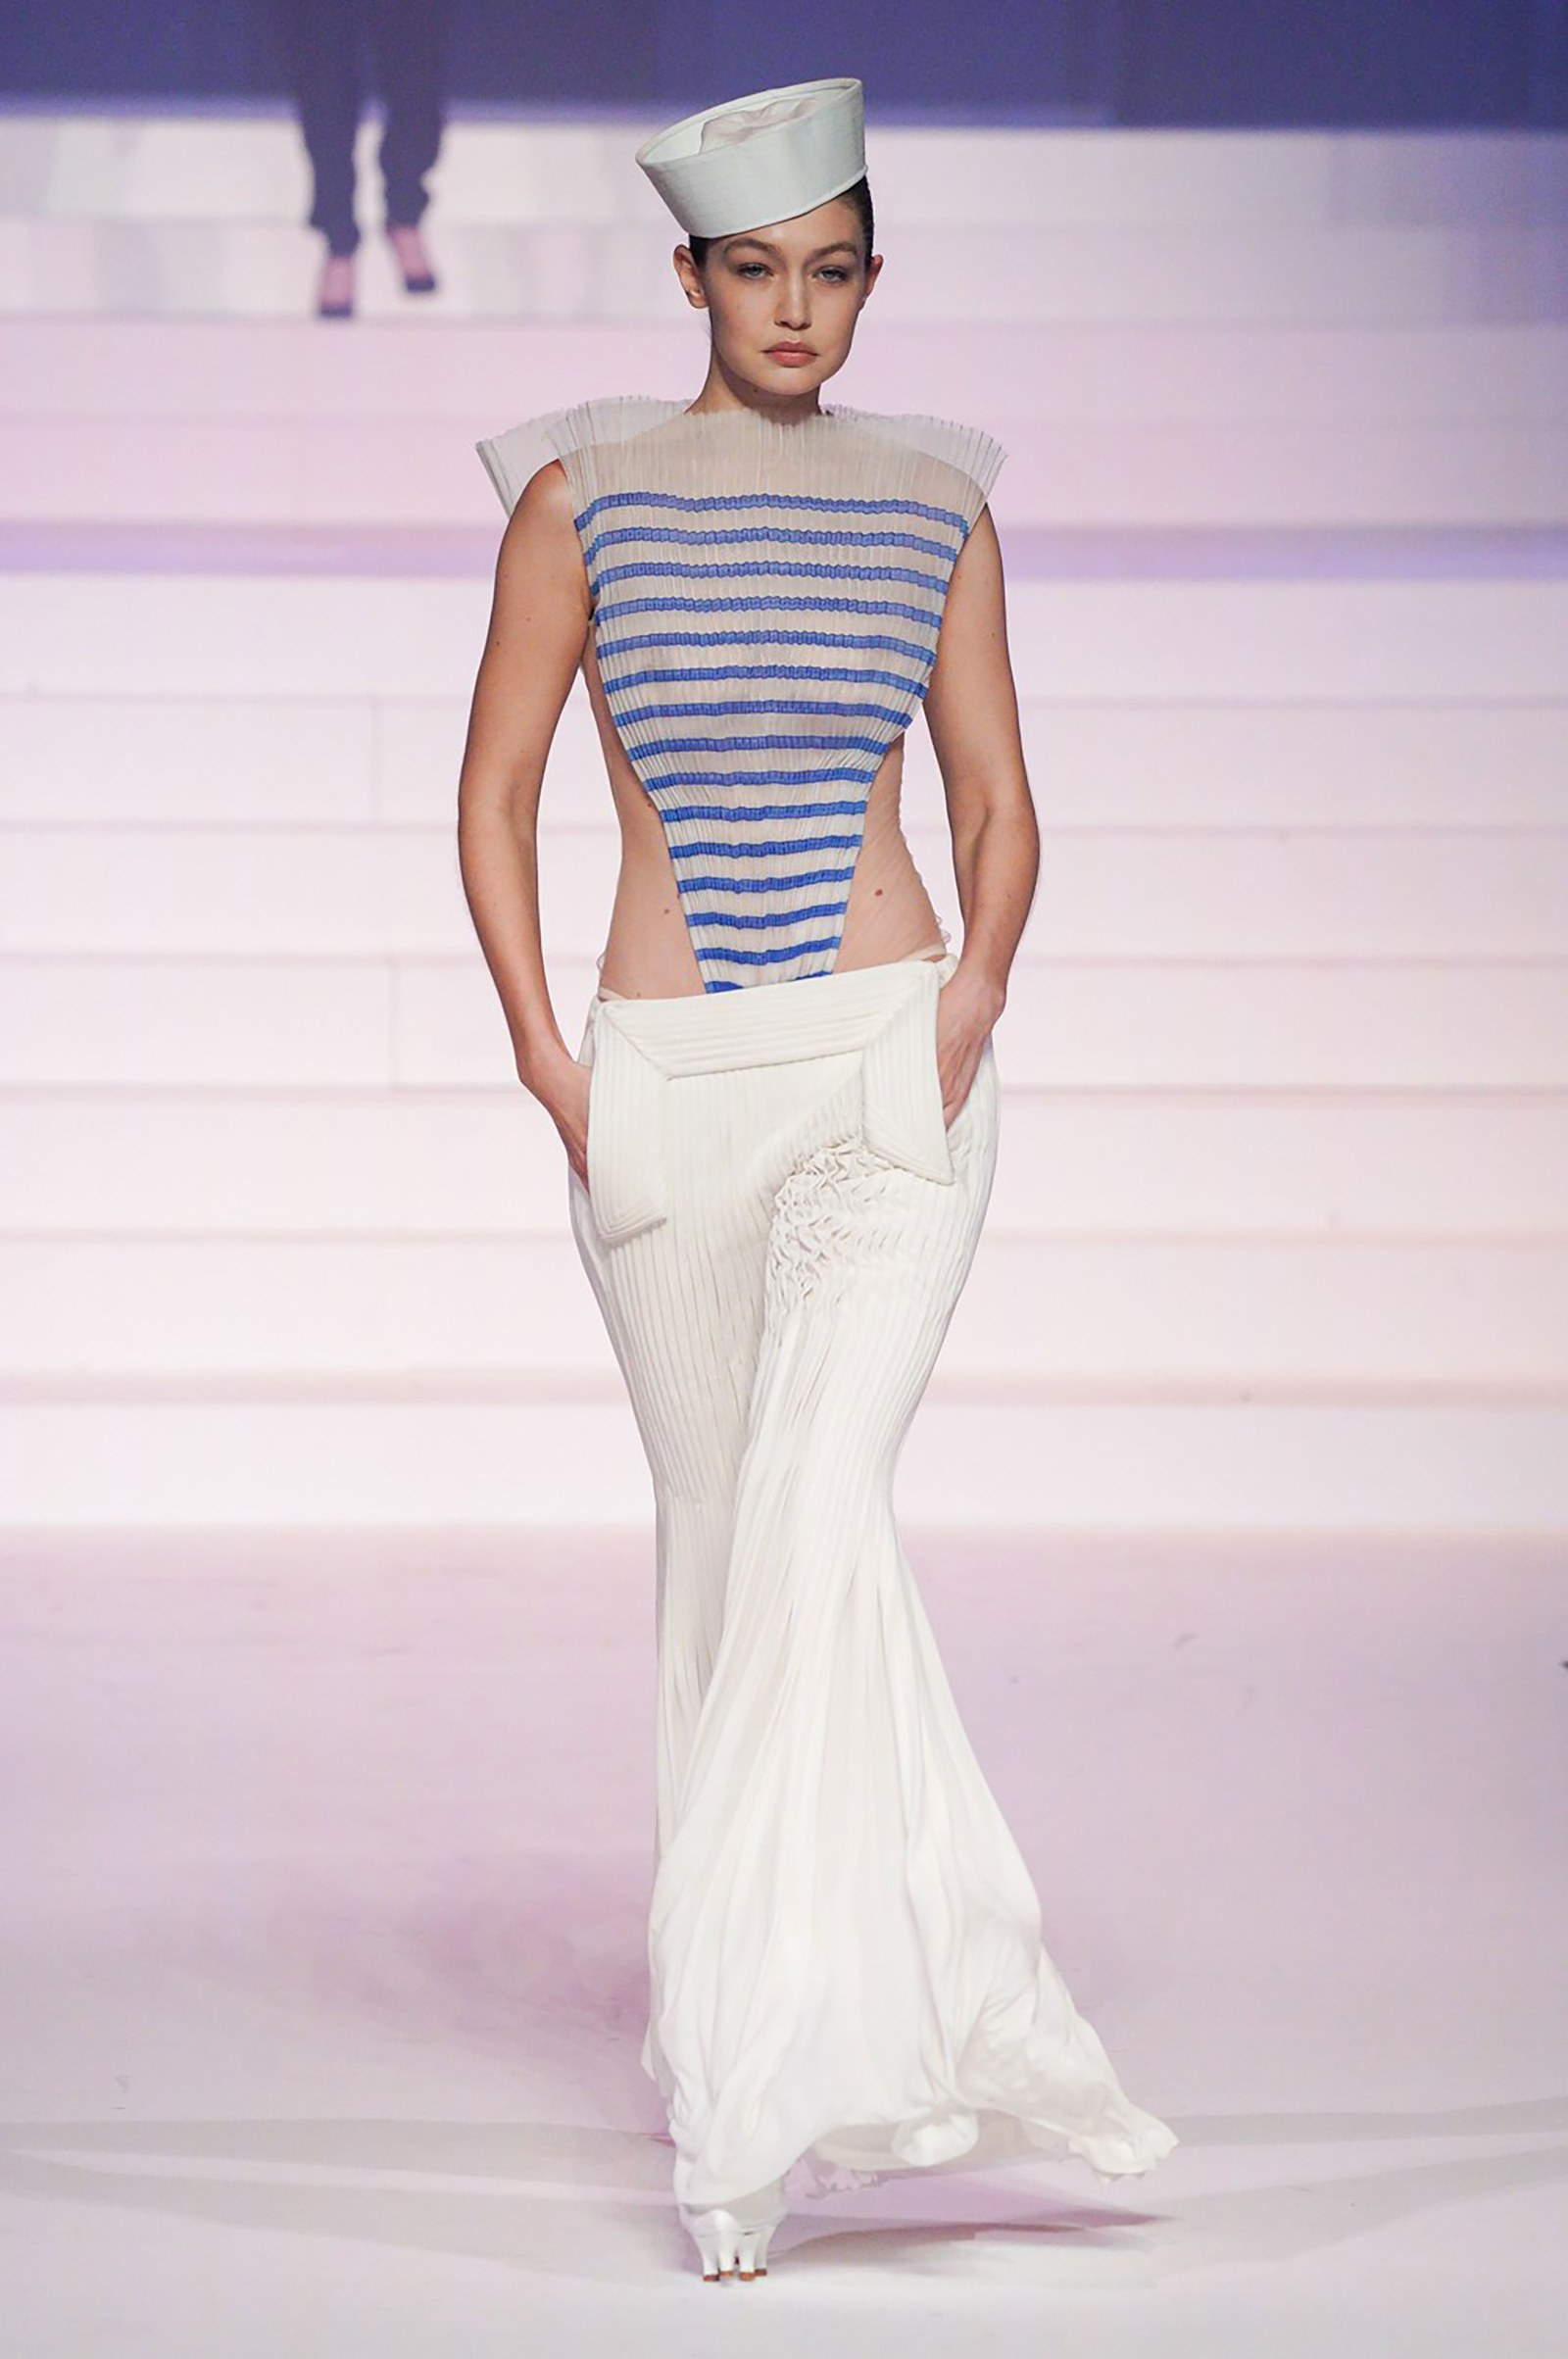 Gigi Hadid at Jean-Paul Gaultier SS20 Haute Couture (Photo credit: Jean-Paul Gaultier)